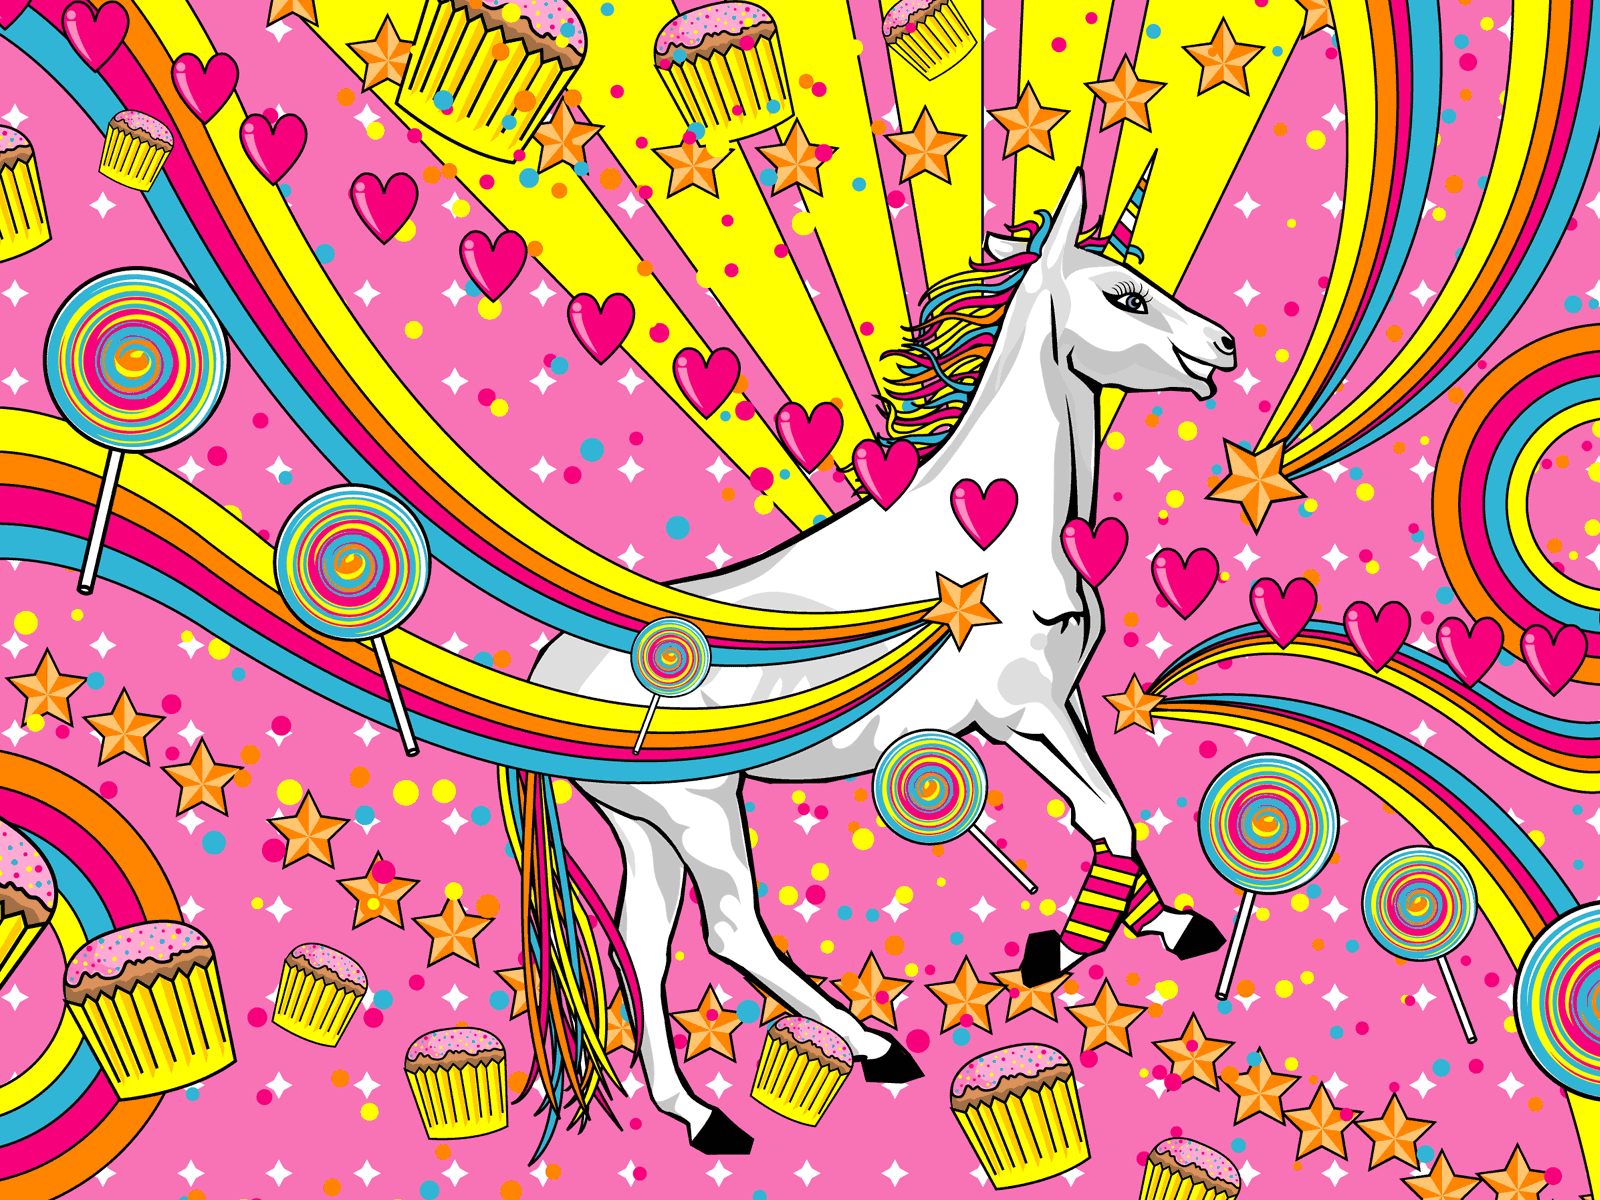 Unicorn Wallpaper 1600x1200 Unicorn 1600x1200